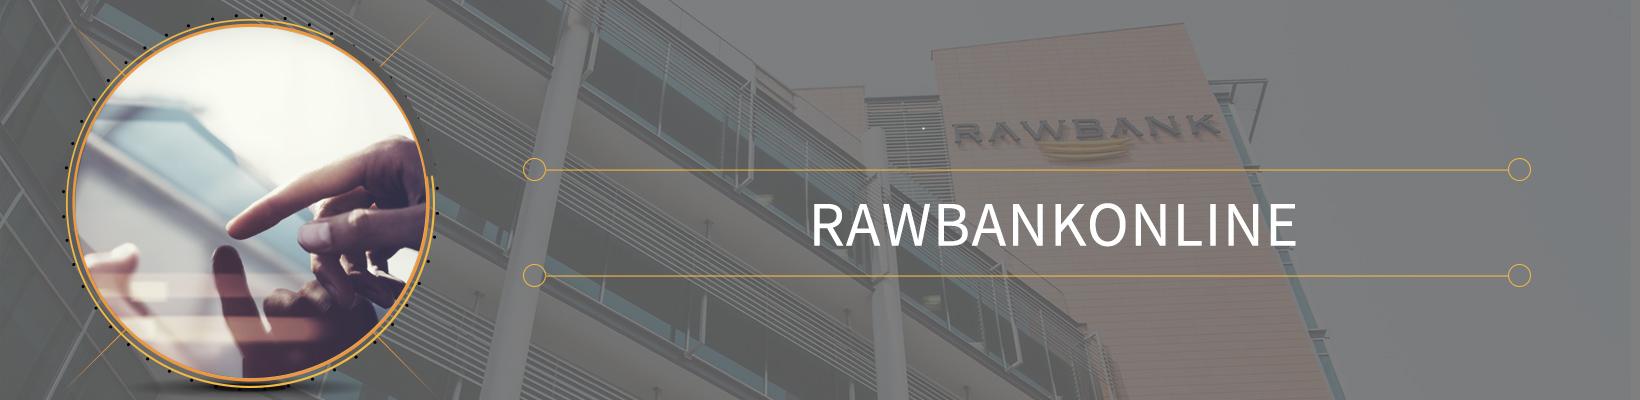 1640x400-Rawbankonline